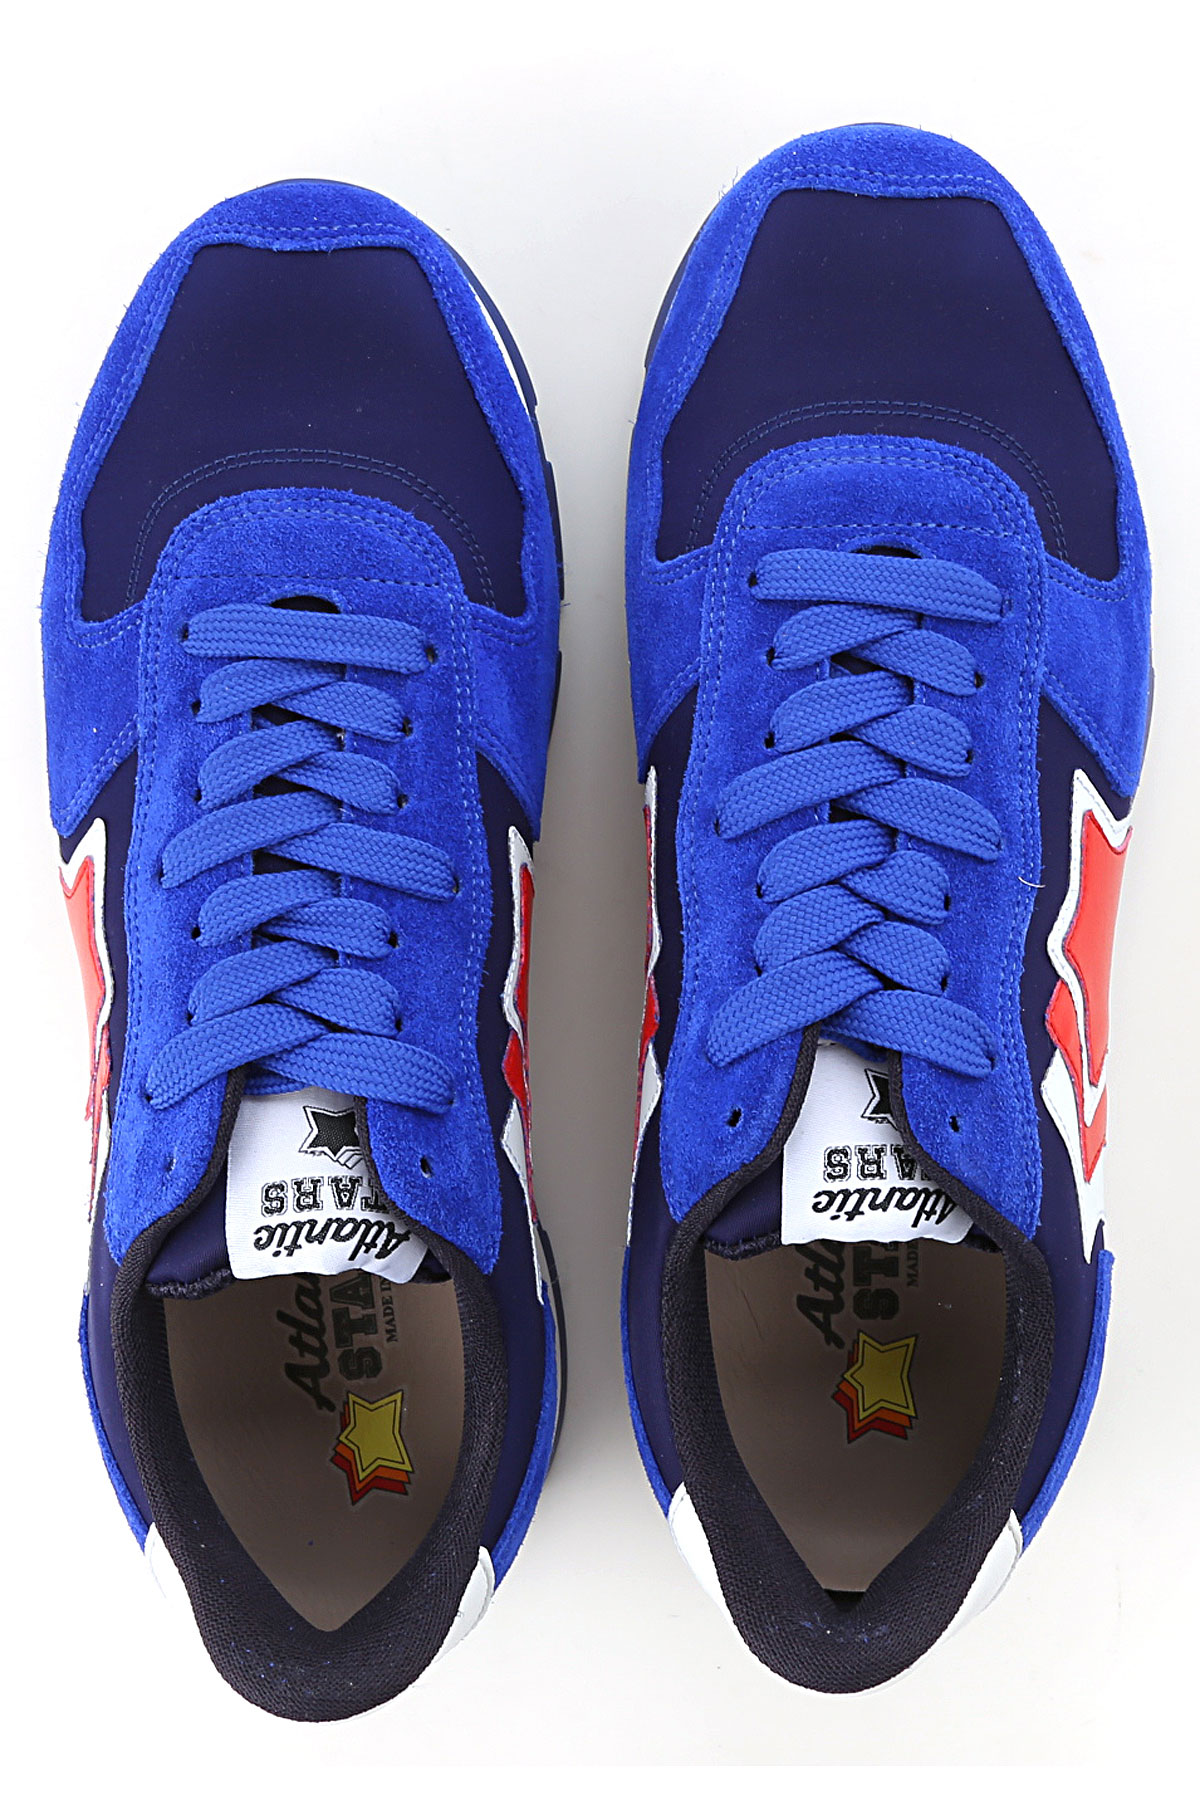 Atlantic verano Rojo Para Zapatos Bluette 2019 Stars nbsp;blanco Primavera Hombres PXwrP8q